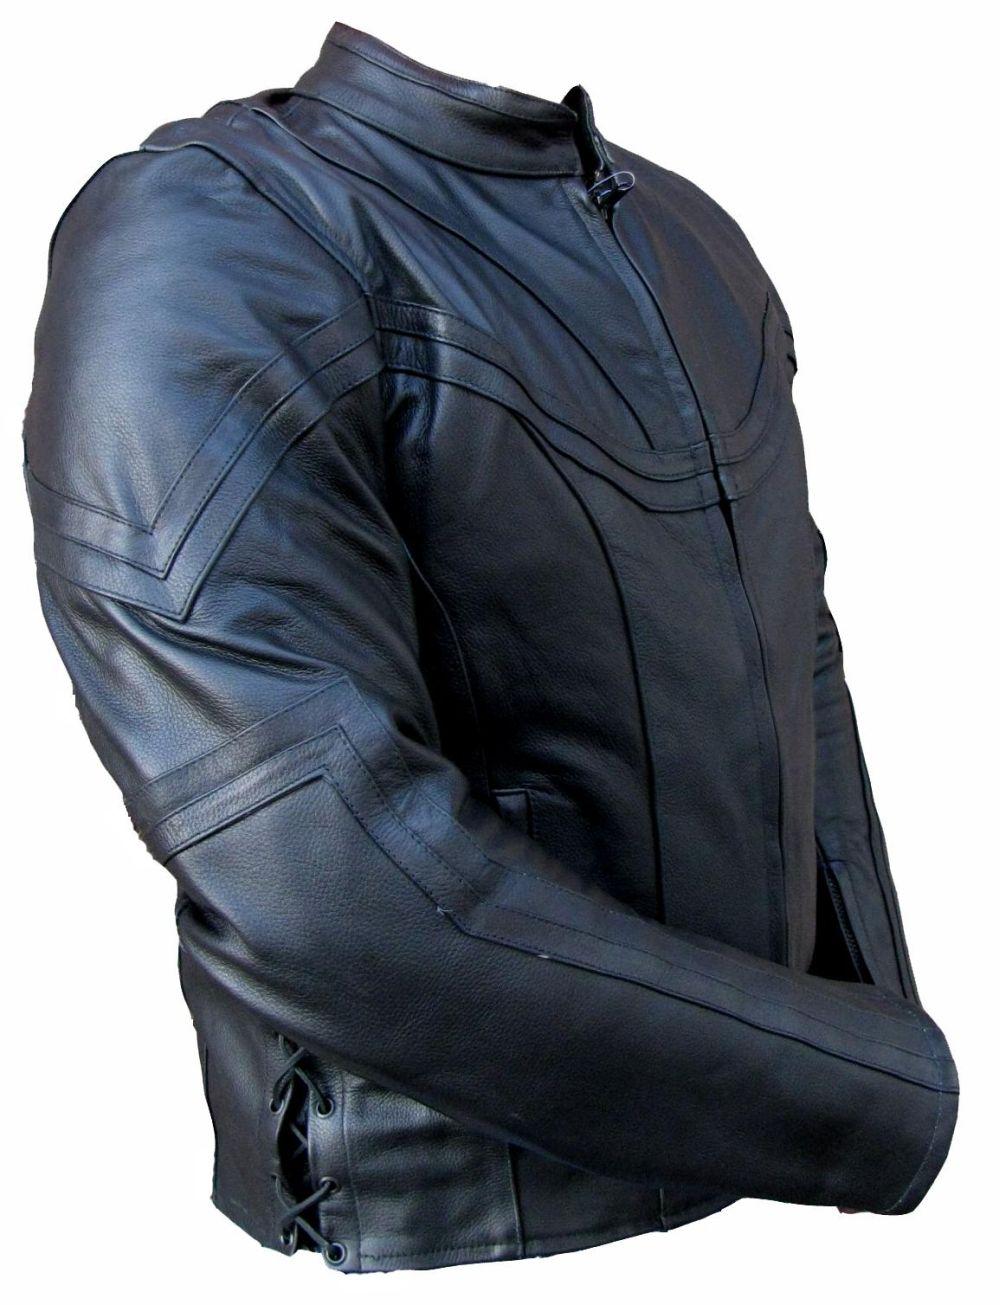 Motorradjacke Jacke Lederjacke Schwarz Leder mit Schnürung Gr. M - XXXL